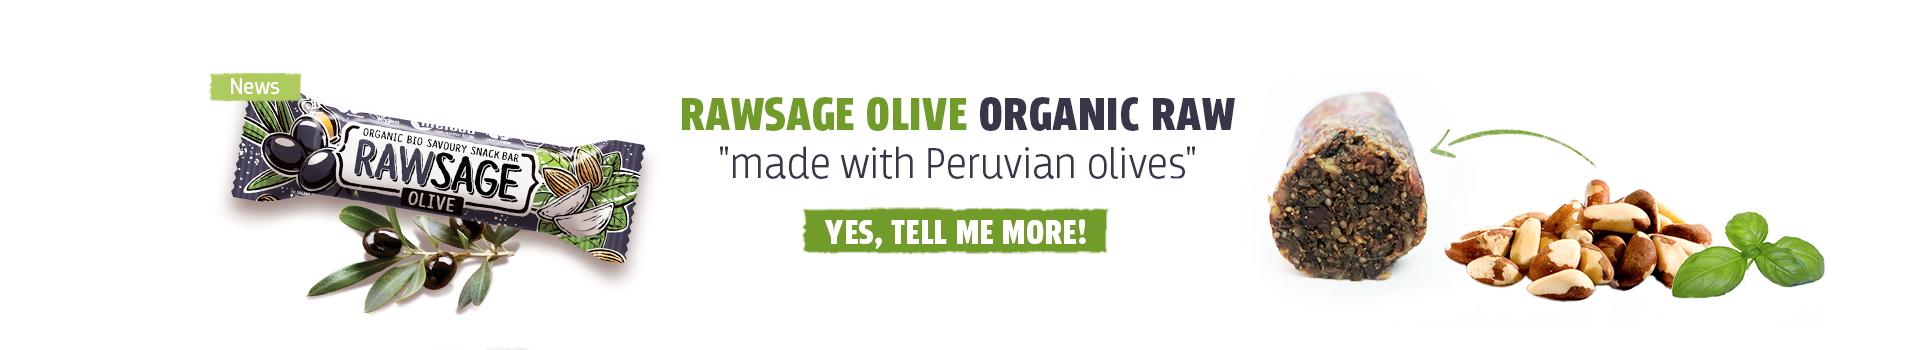 New Rawsage Olive